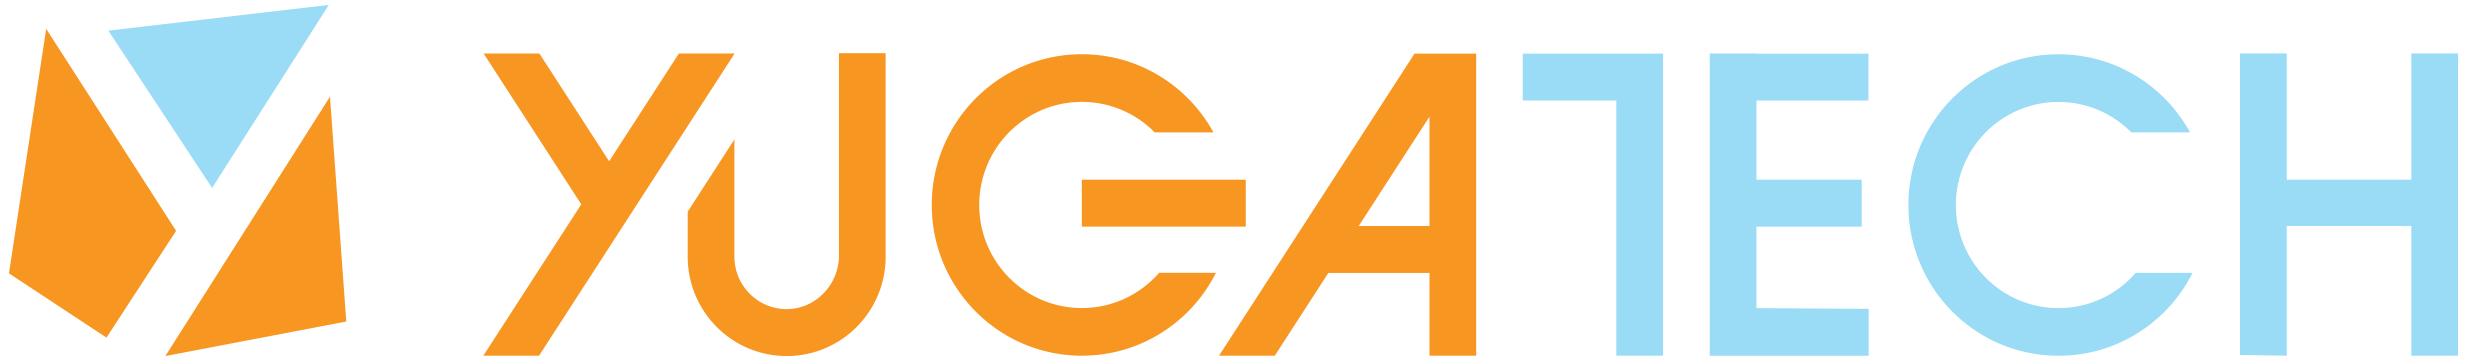 YugaTech | Philippines Tech News & Reviews